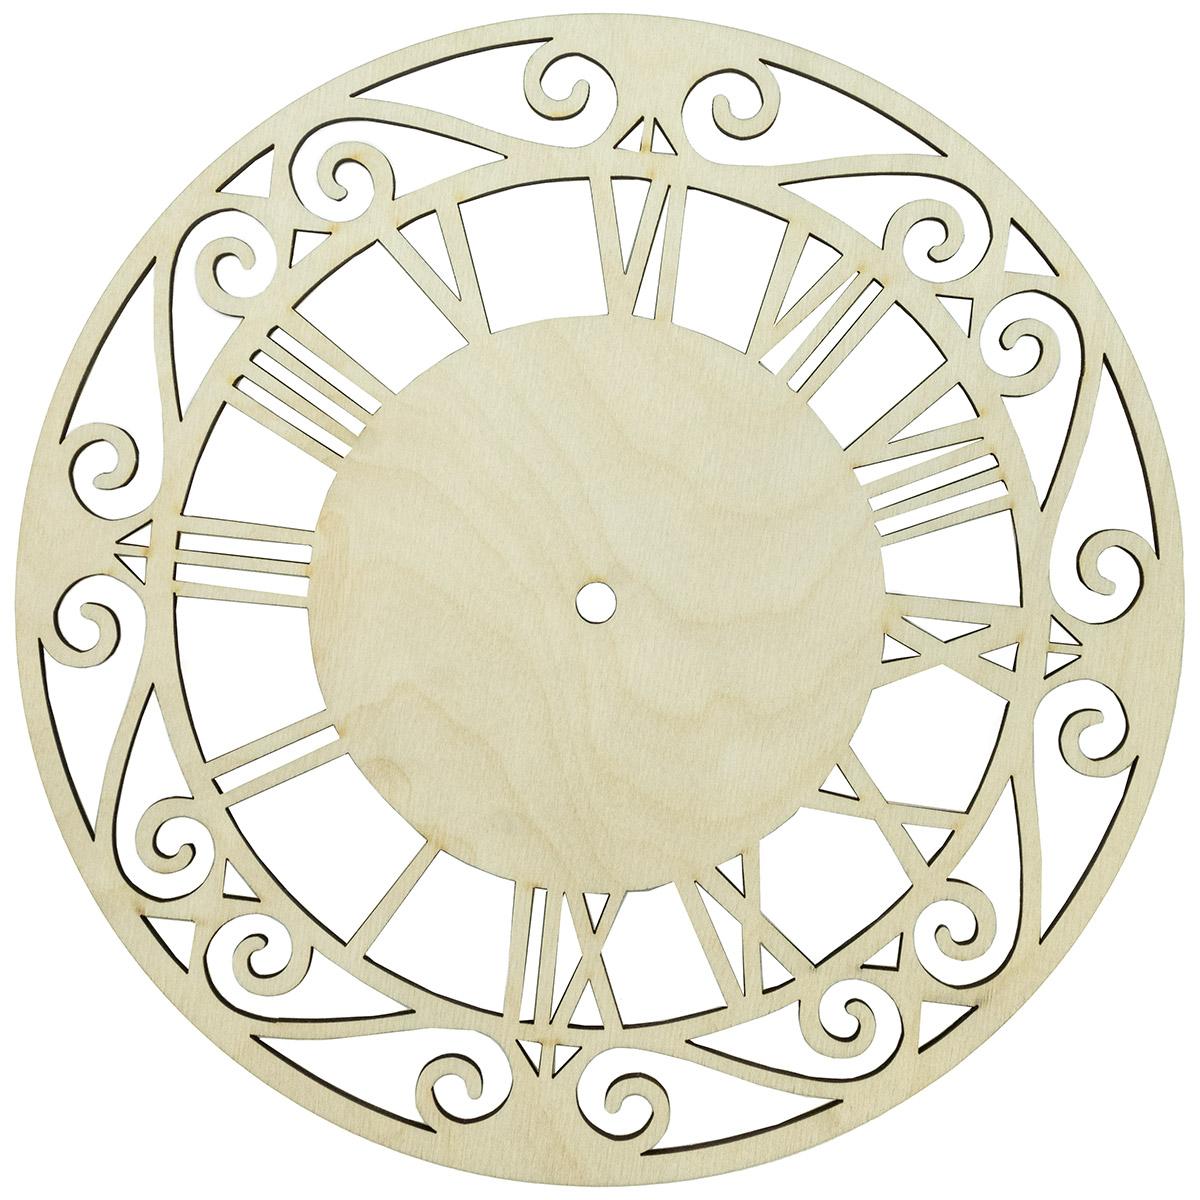 L-325 Деревянная заготовка циферблат 'Римский', 24*24 см, 'Астра'